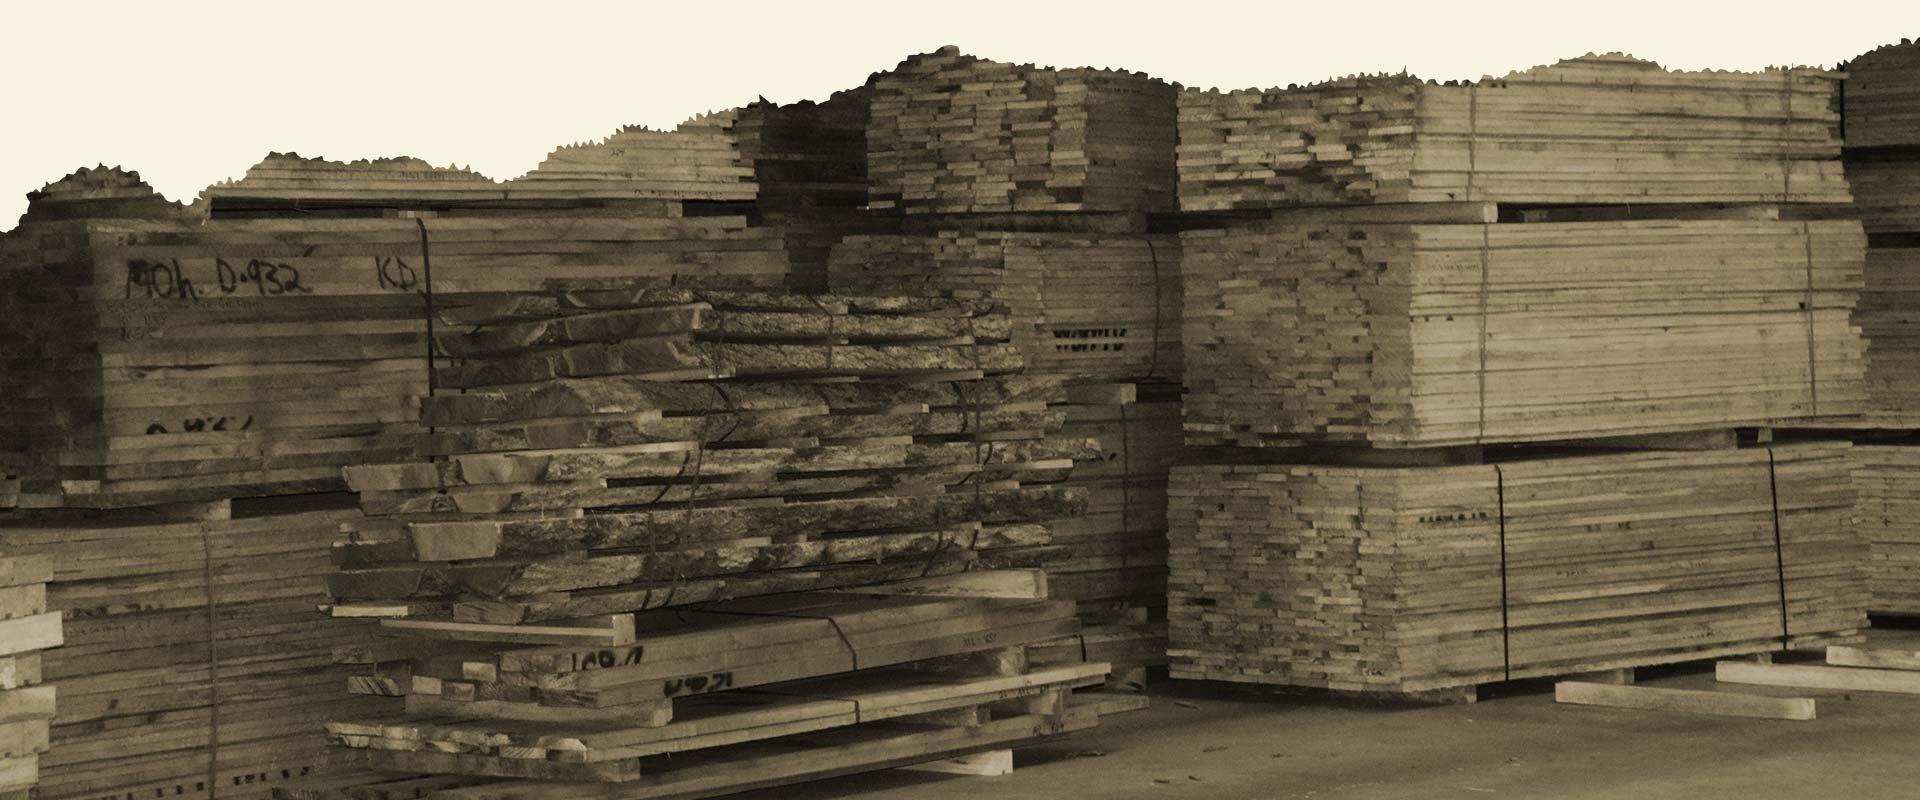 Mohawk Lumber - Timber Buyers in Applecreek Ohio